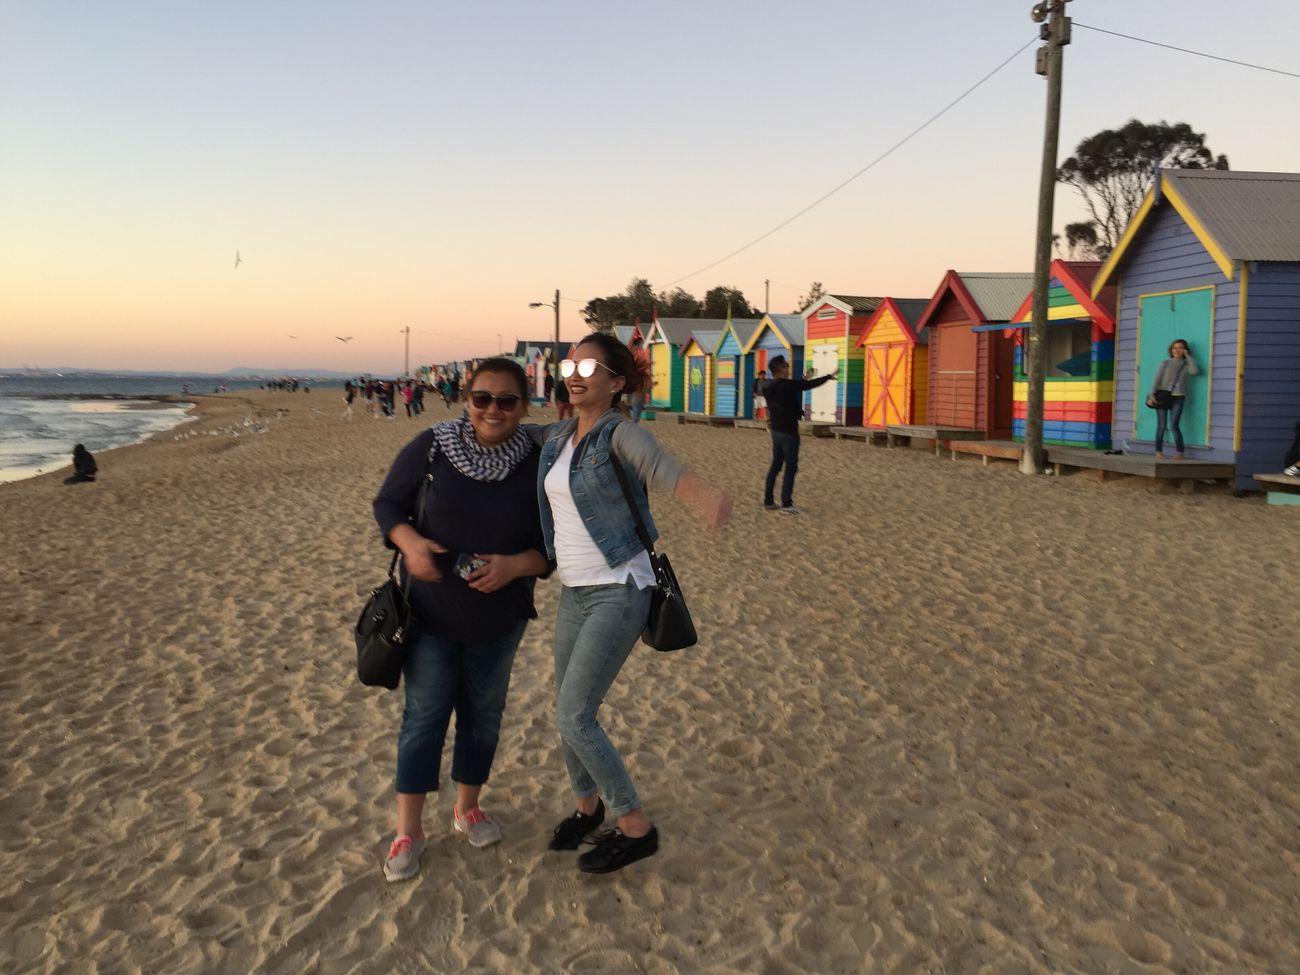 Yg di belakang itu lg cari pose apa ya? 😁 Duet Papi&mami Bathing Boxes Brighton Beach